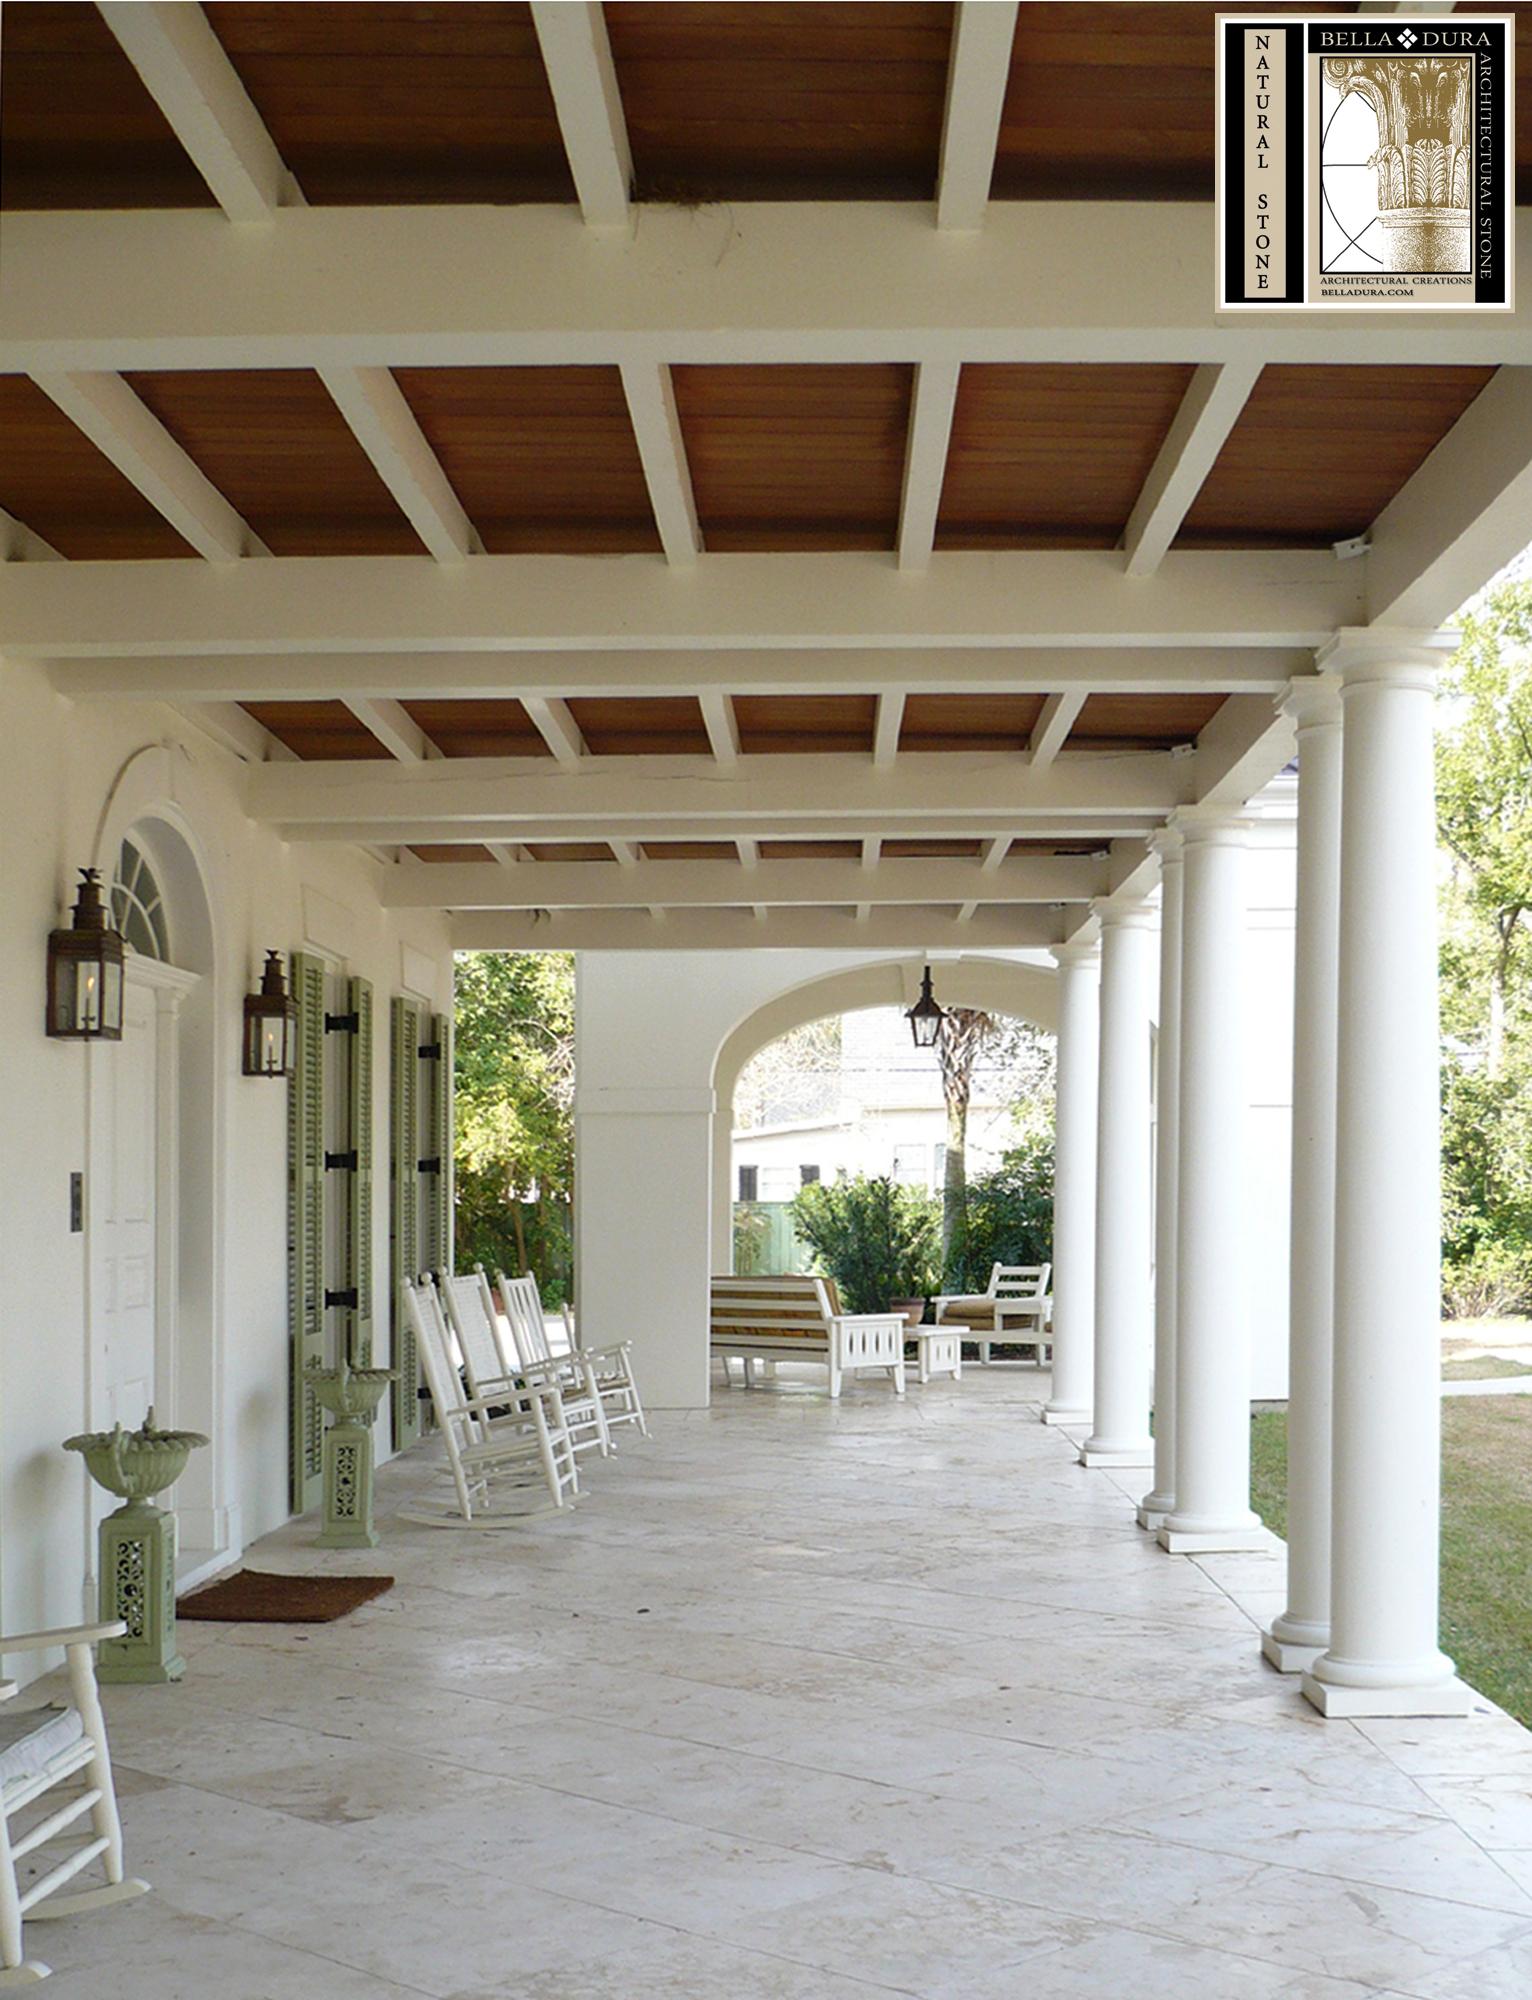 Pritchard_Macedonia front porch2000x1532_P1030991.jpg